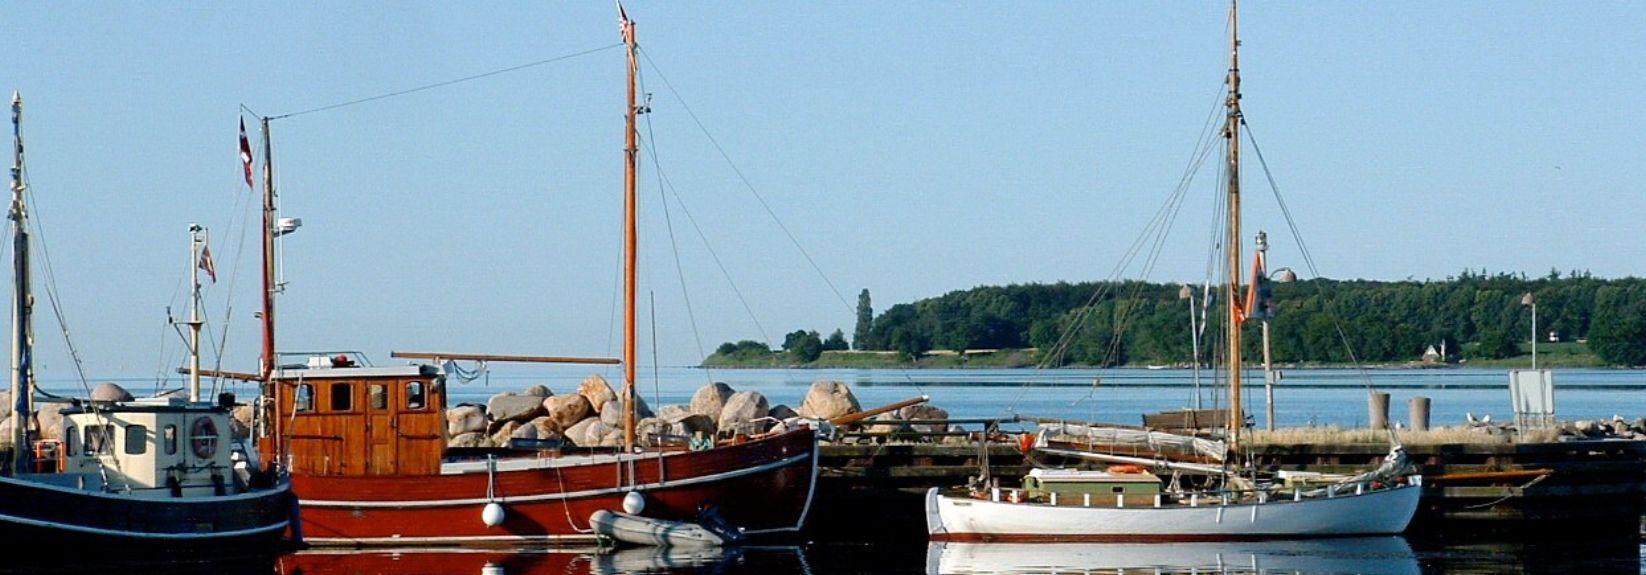 Broby, Denmark